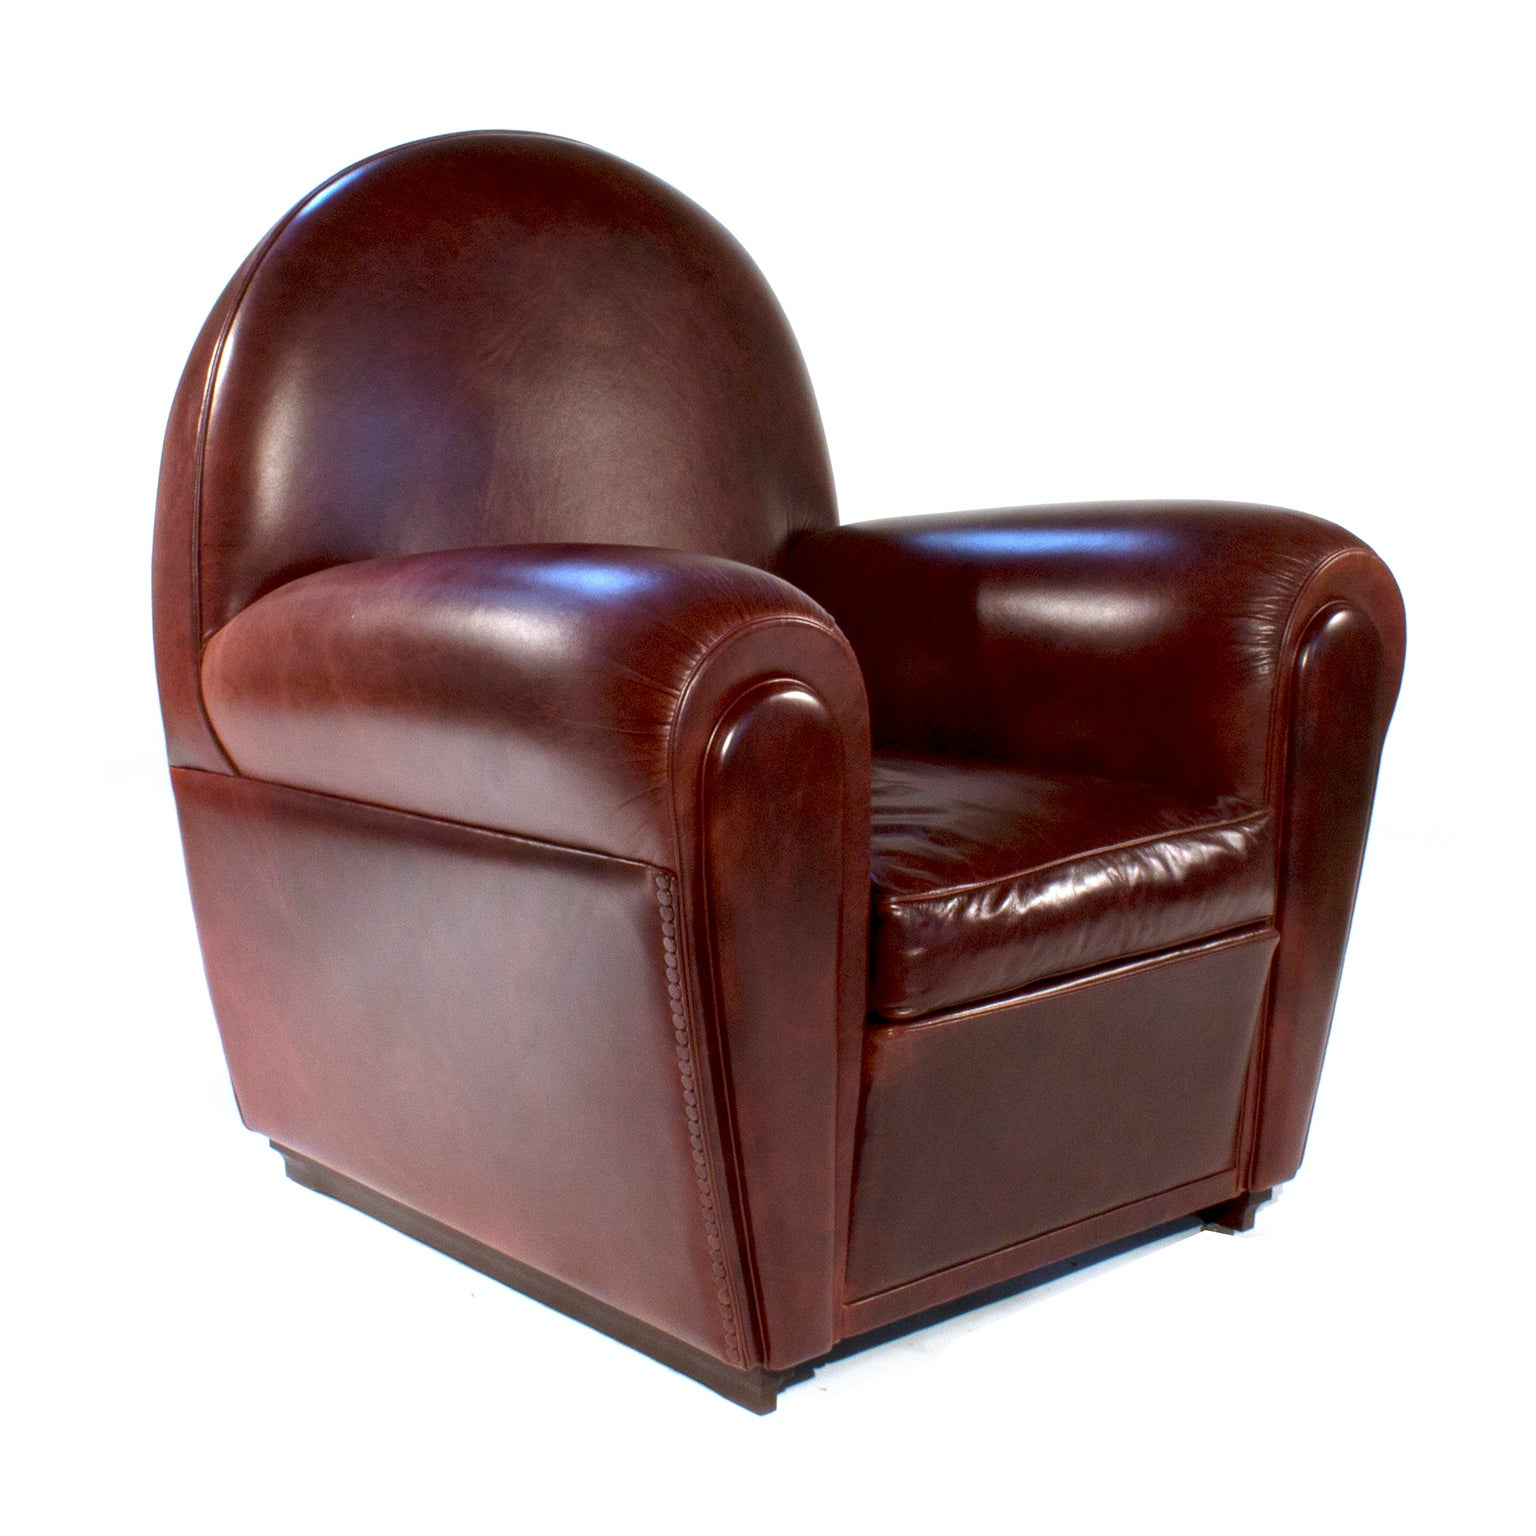 Vanity Fair Leather Lounge Armchair by Renzo Frau for Poltrona Frau ...